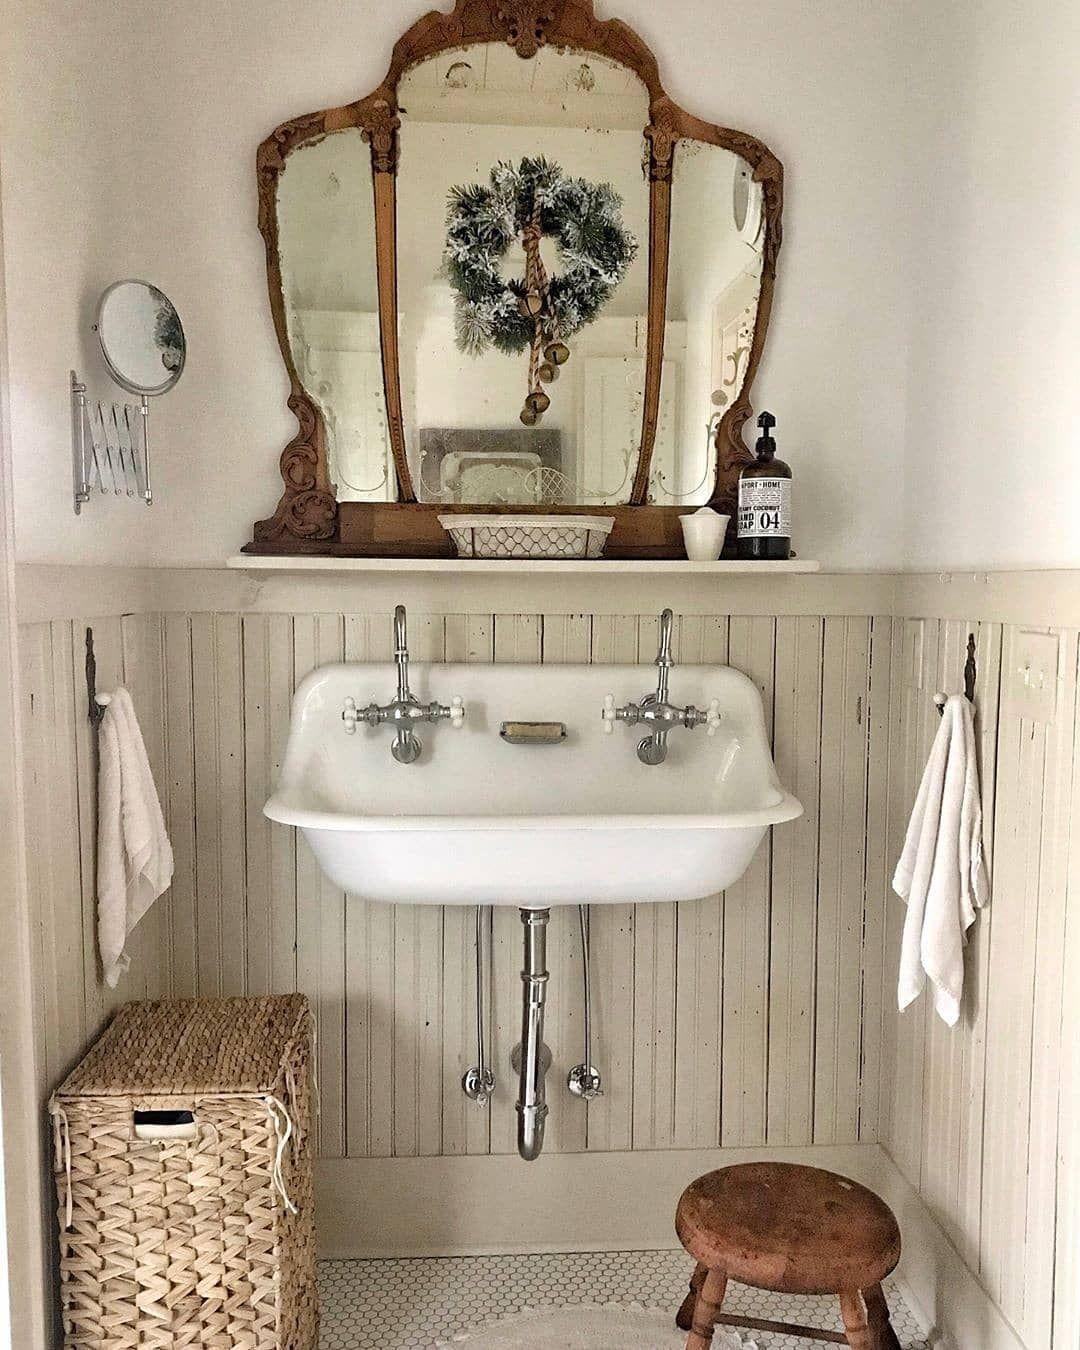 Legno ferro fai da te. Heyfoo Antique Homedecor Shop On Instagram Looking For Inspiration Thinking About My Bathroom S Bagno Shabby Chic Idee Bagno Rustico Arredo Bagno Vintage